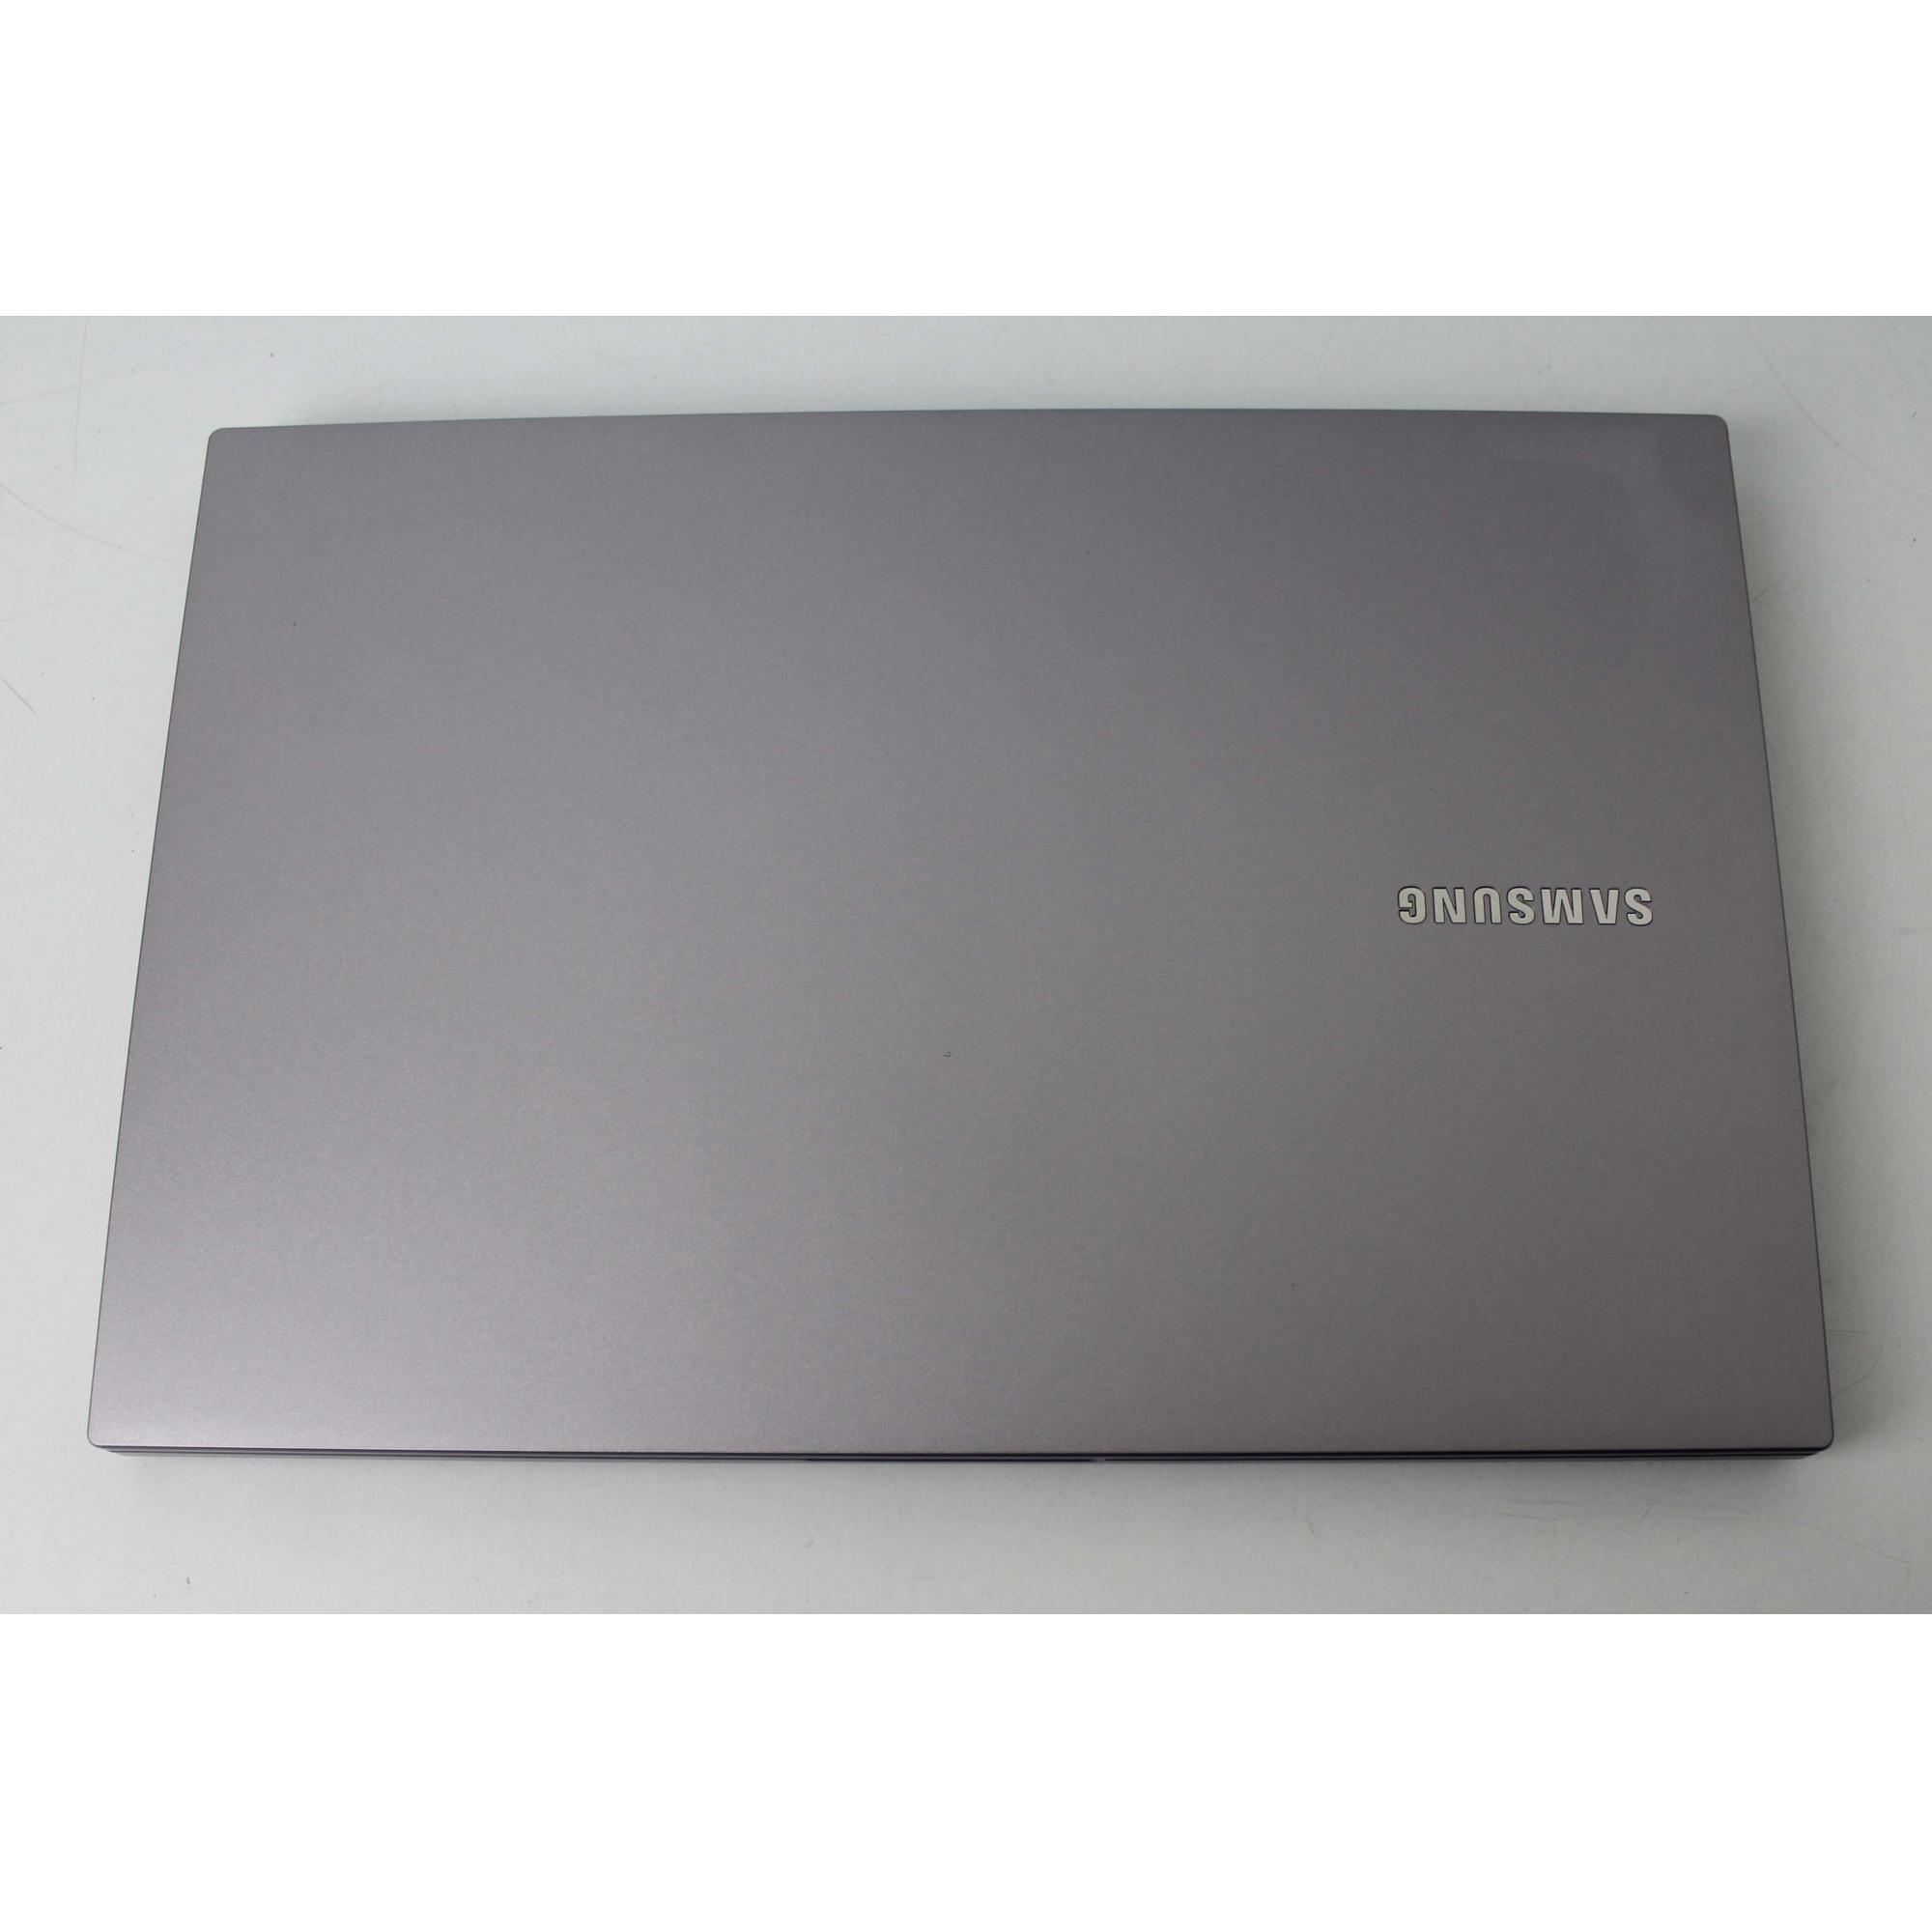 "NOTEBOOK SAMSUNG BOOK E20 15.6"" DUAL CORE 4GB HD-500GB + ALPHANUMÉRICO"